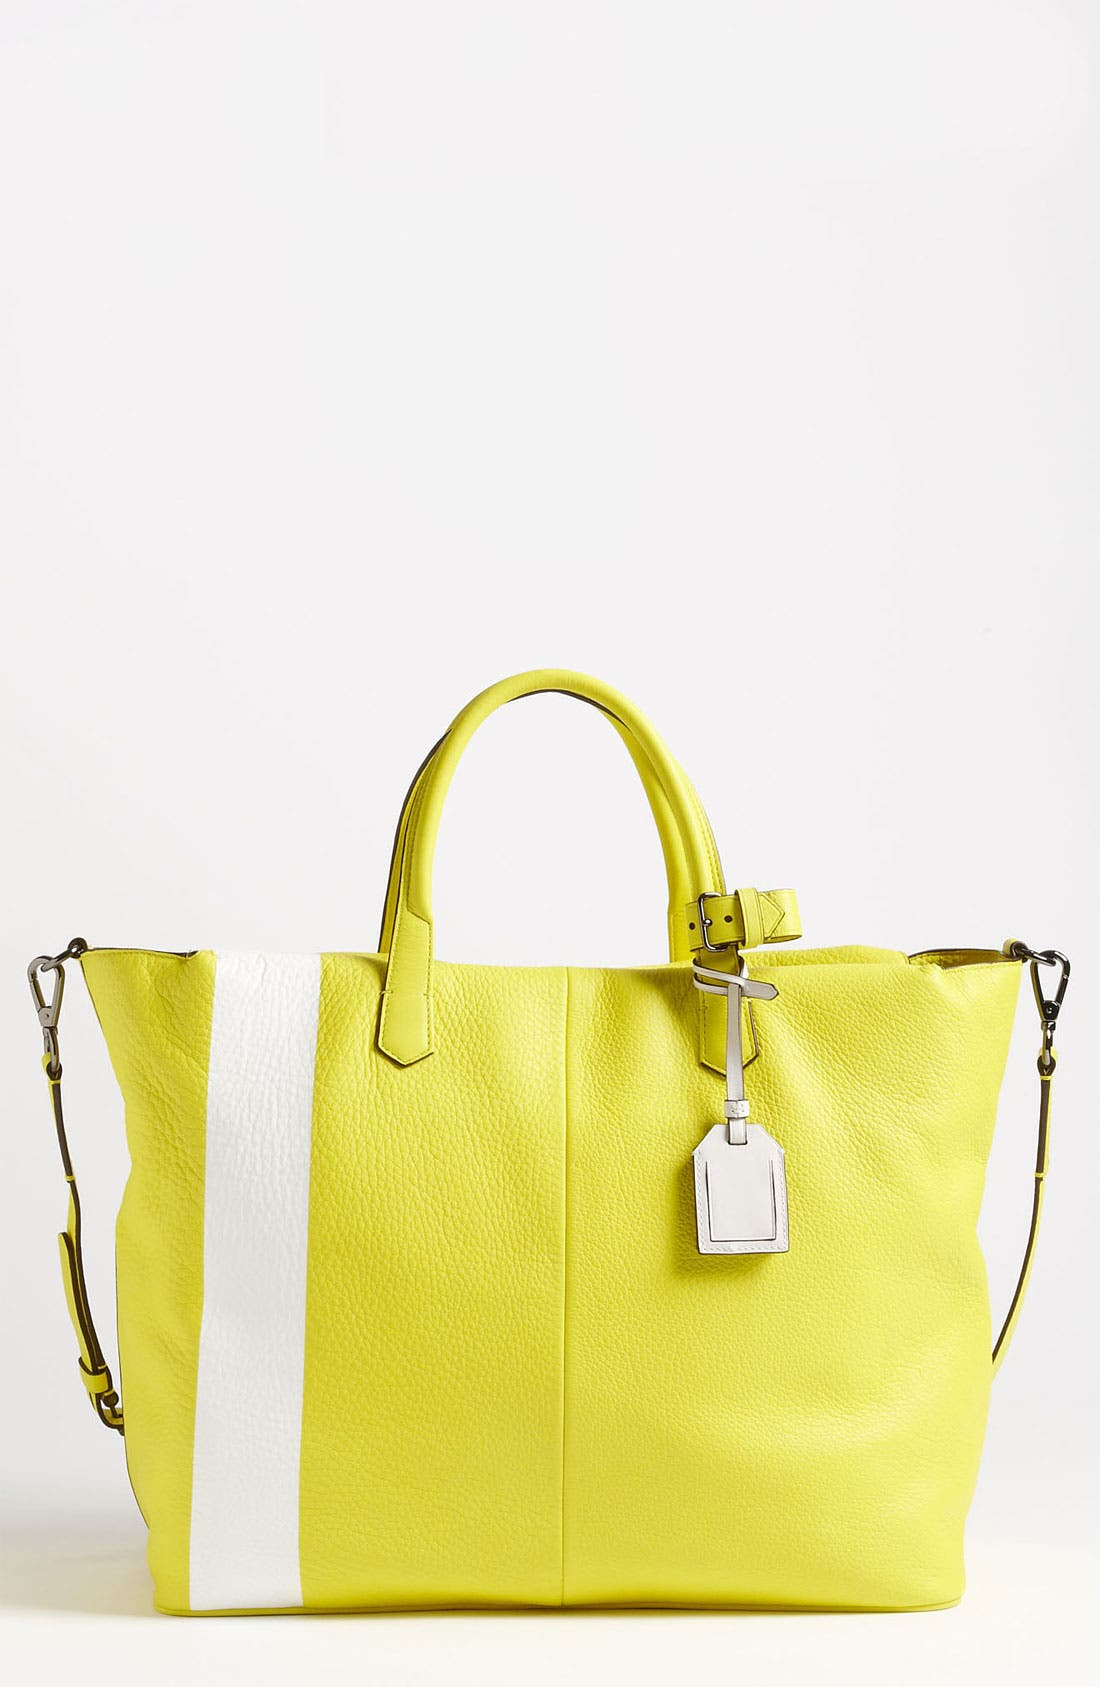 Main Image - Reed Krakoff 'Gym Bag I' Leather Satchel